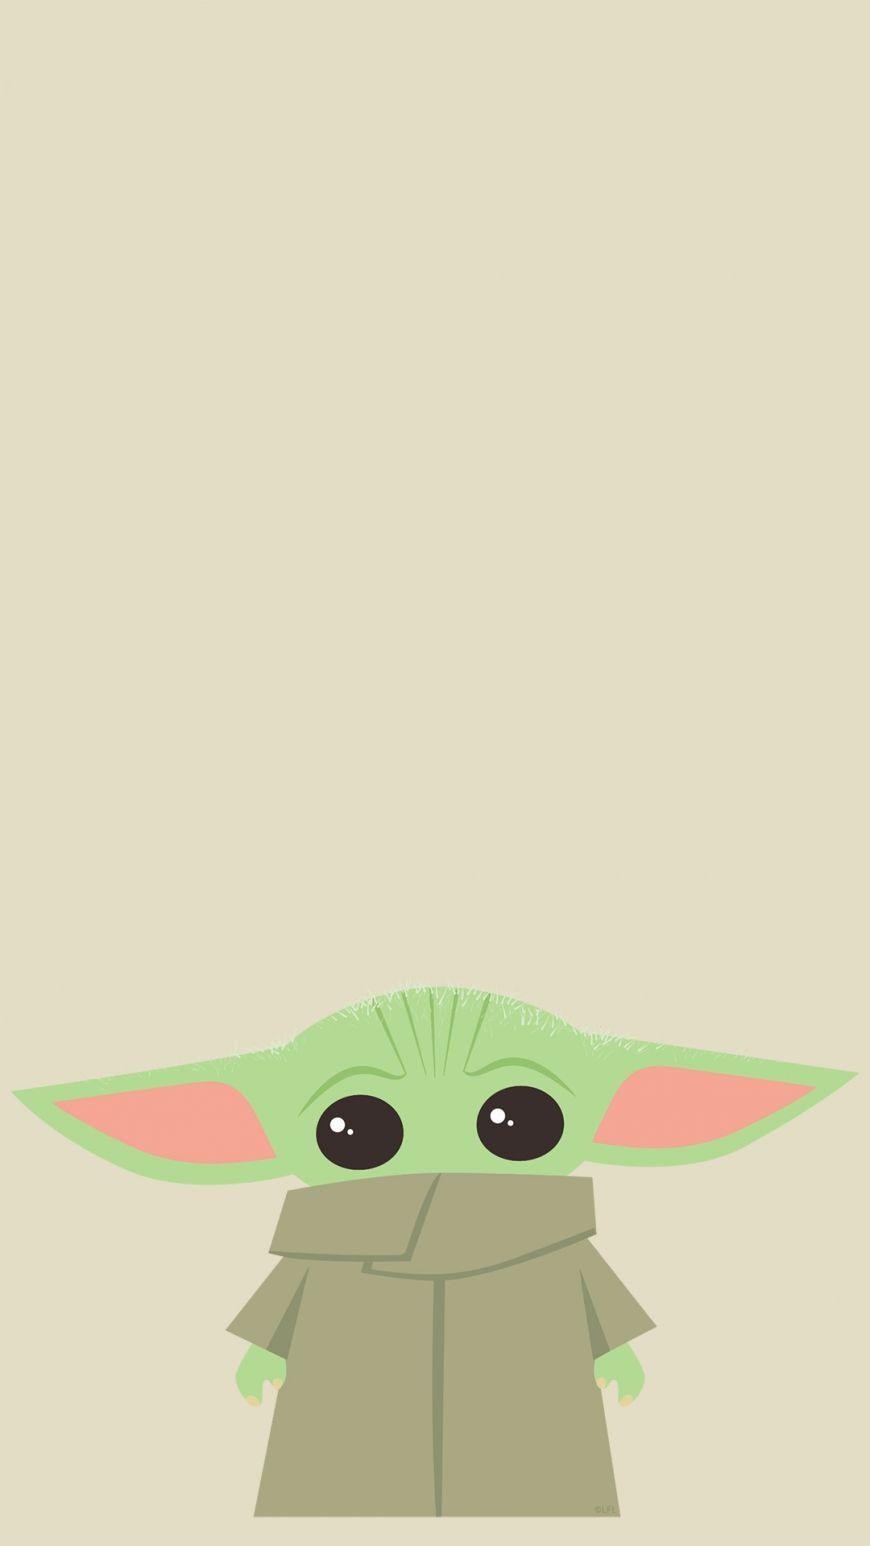 Cute Baby Yoda Wallpaper In 2021 Yoda Wallpaper Cartoon Wallpaper Iphone Cartoon Wallpaper Trends for baby yoda wallpaper iphone 7